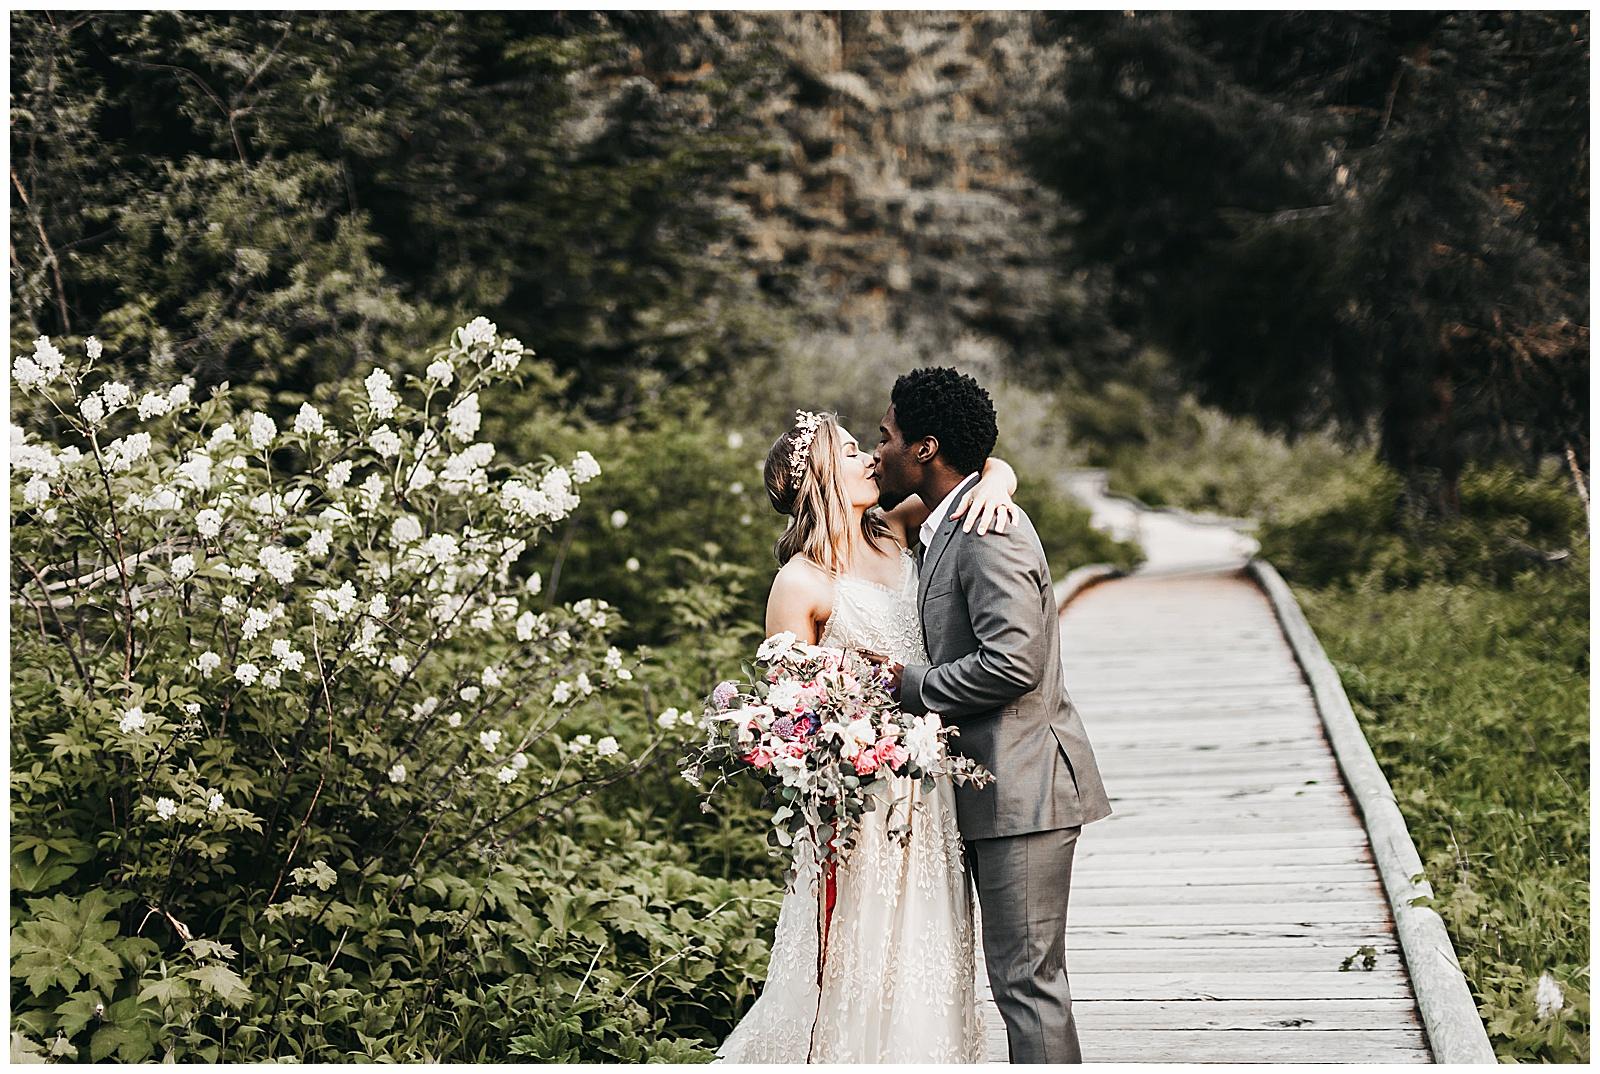 seattle-wedding-photographer-seattle-elopement-photographer-anniezav_0034.jpg